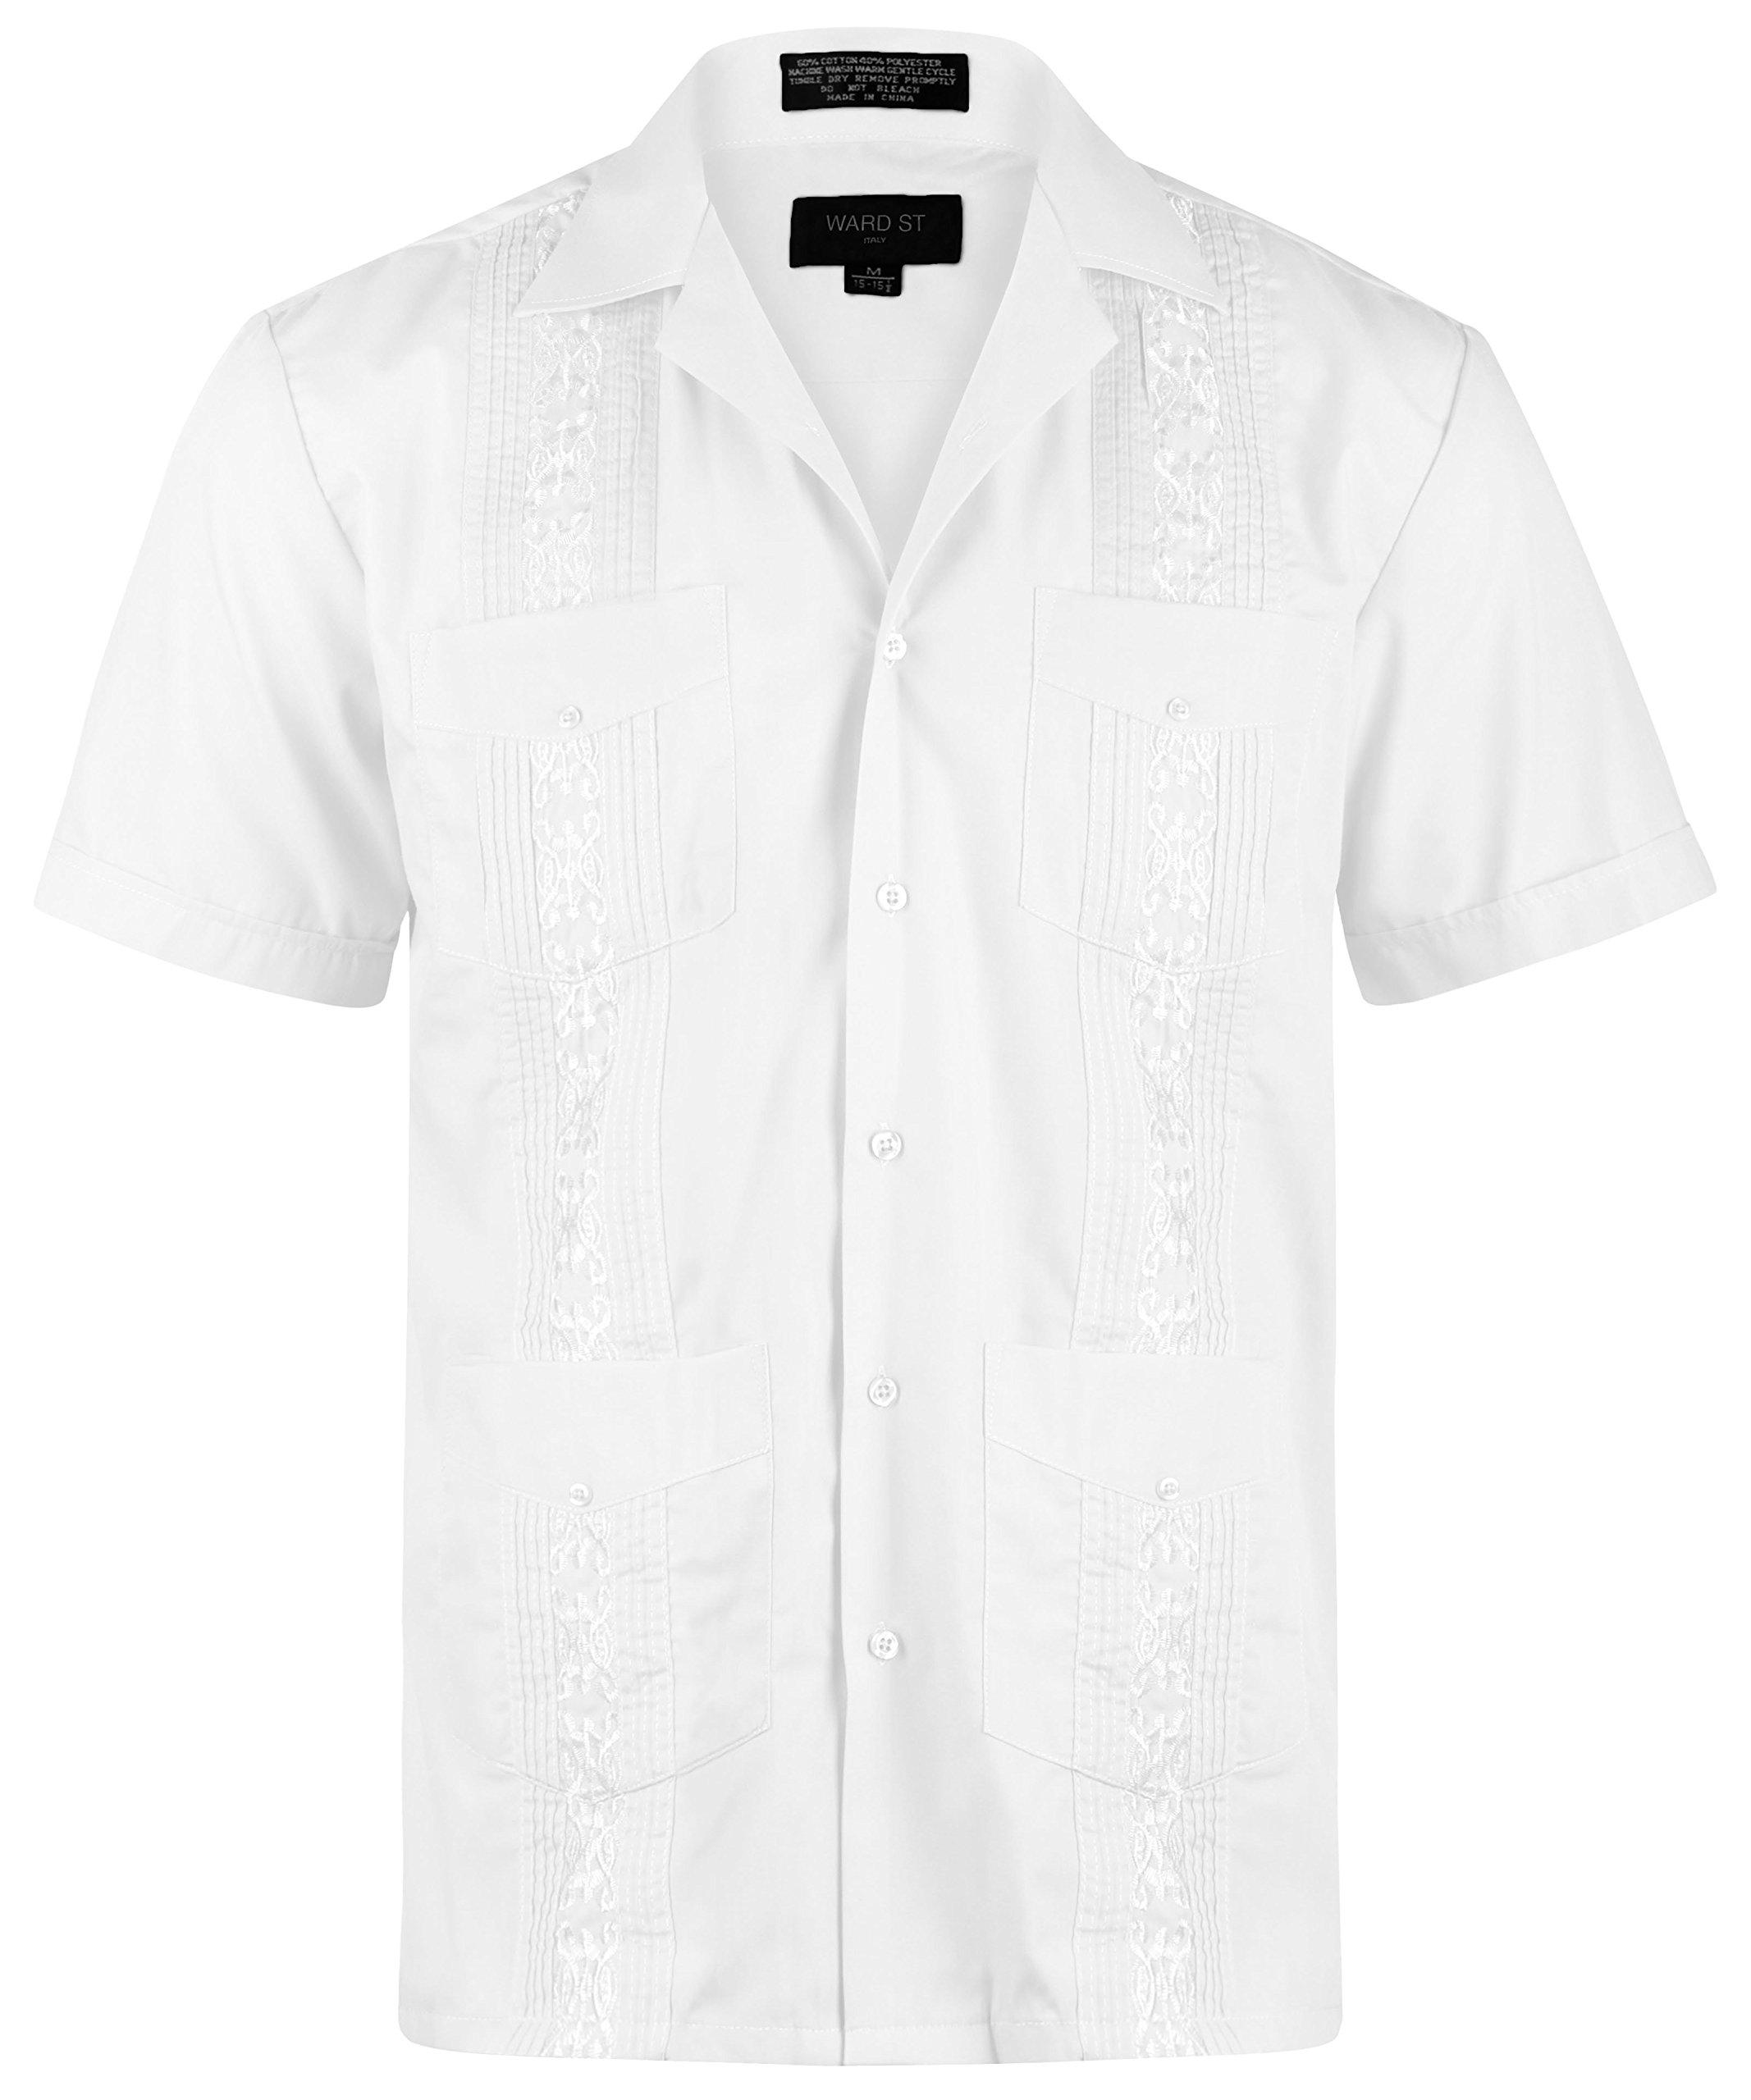 Ward St Men's Short Sleeve Cuban Guayabera, L, 16-16.5N, White